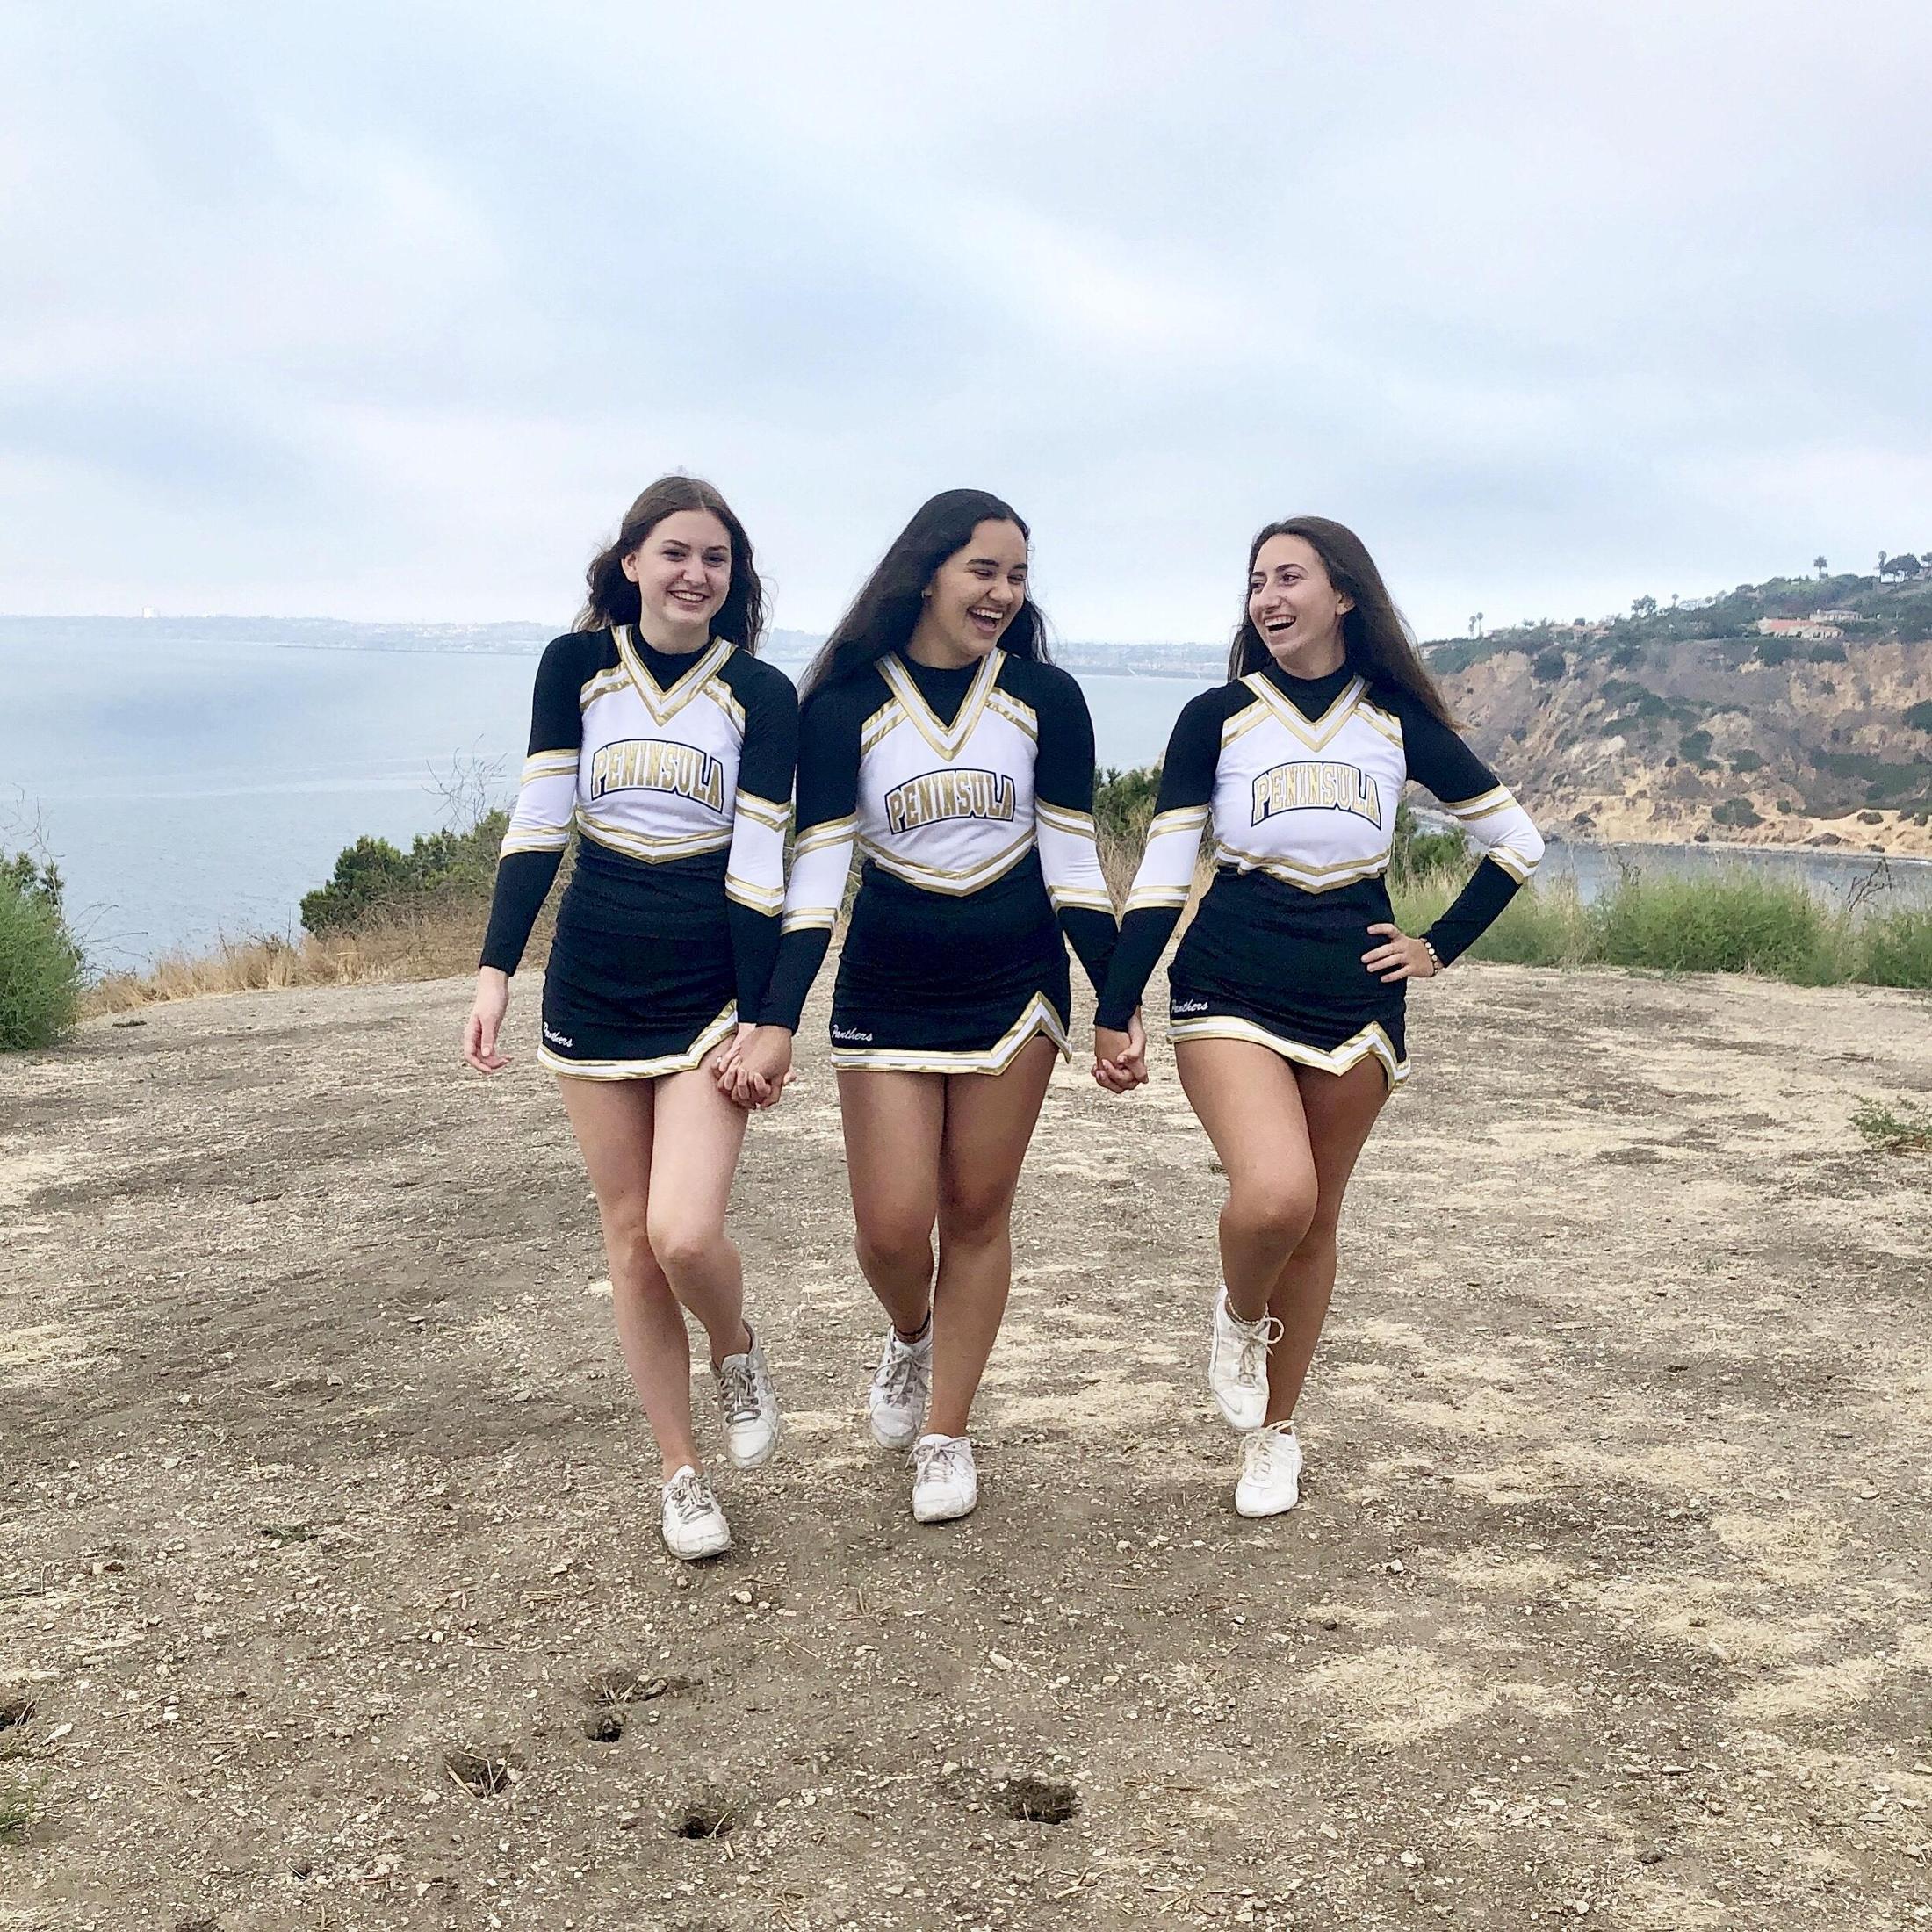 Cheer Team - Athletics / Activities - Palos Verdes regarding Palos Verdes School District Calendar 2021